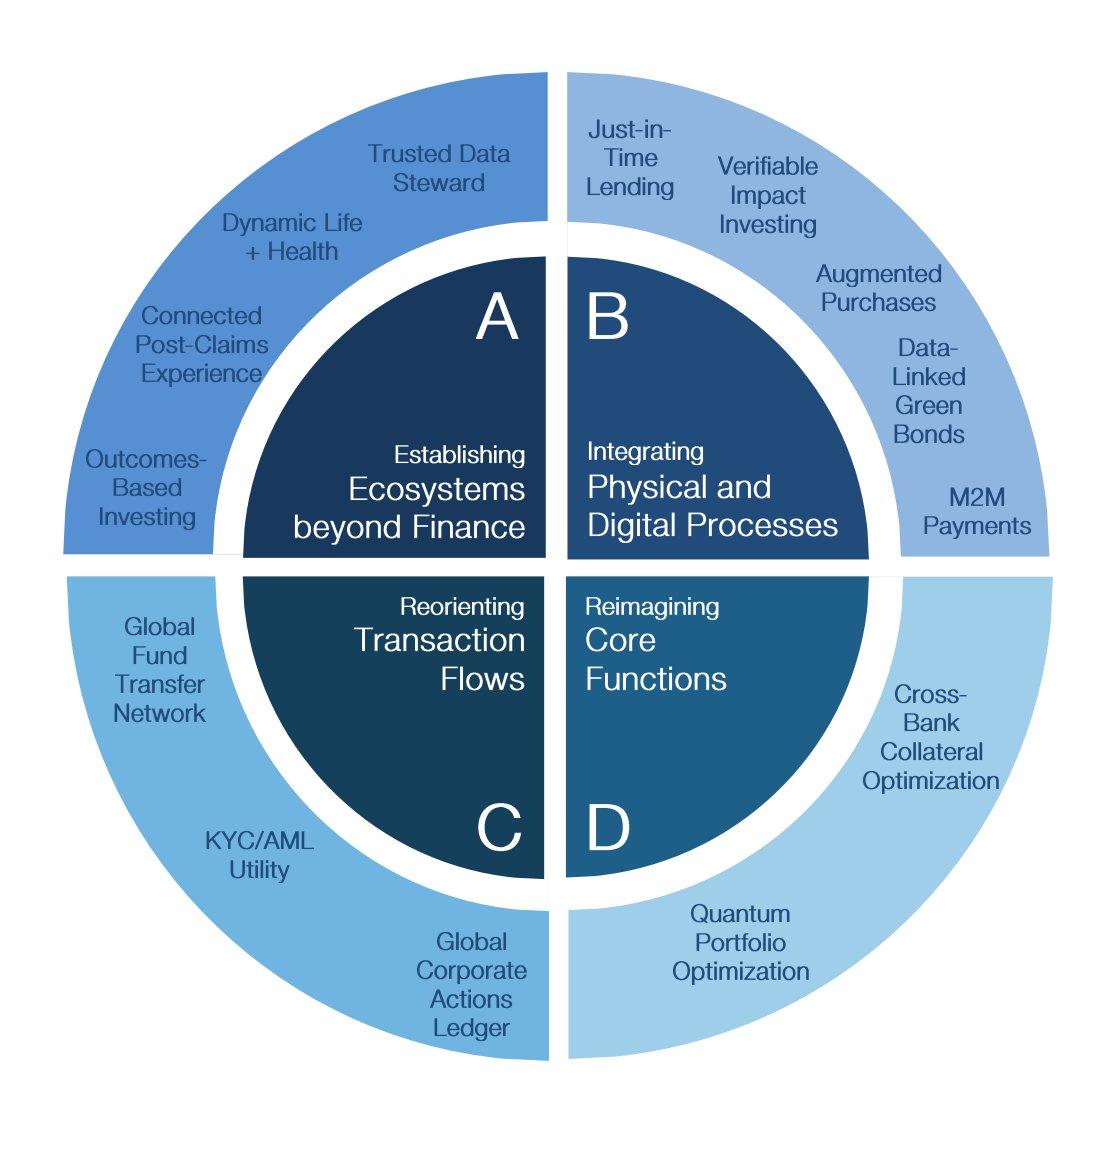 Emerging Technologies Create Banking Transformation Opportunities  200+ page @wef report  https://t.co/lxBM9yglQK  #DigitalTransformation #innovation #tech #AI #MachineLearning  @antgrasso @GlenGilmore @MarshaCollier @DeepLearn007  @KirkDBorne @EvanKirstel @ipfconline1 @jowyang https://t.co/fbpjcjQqGk